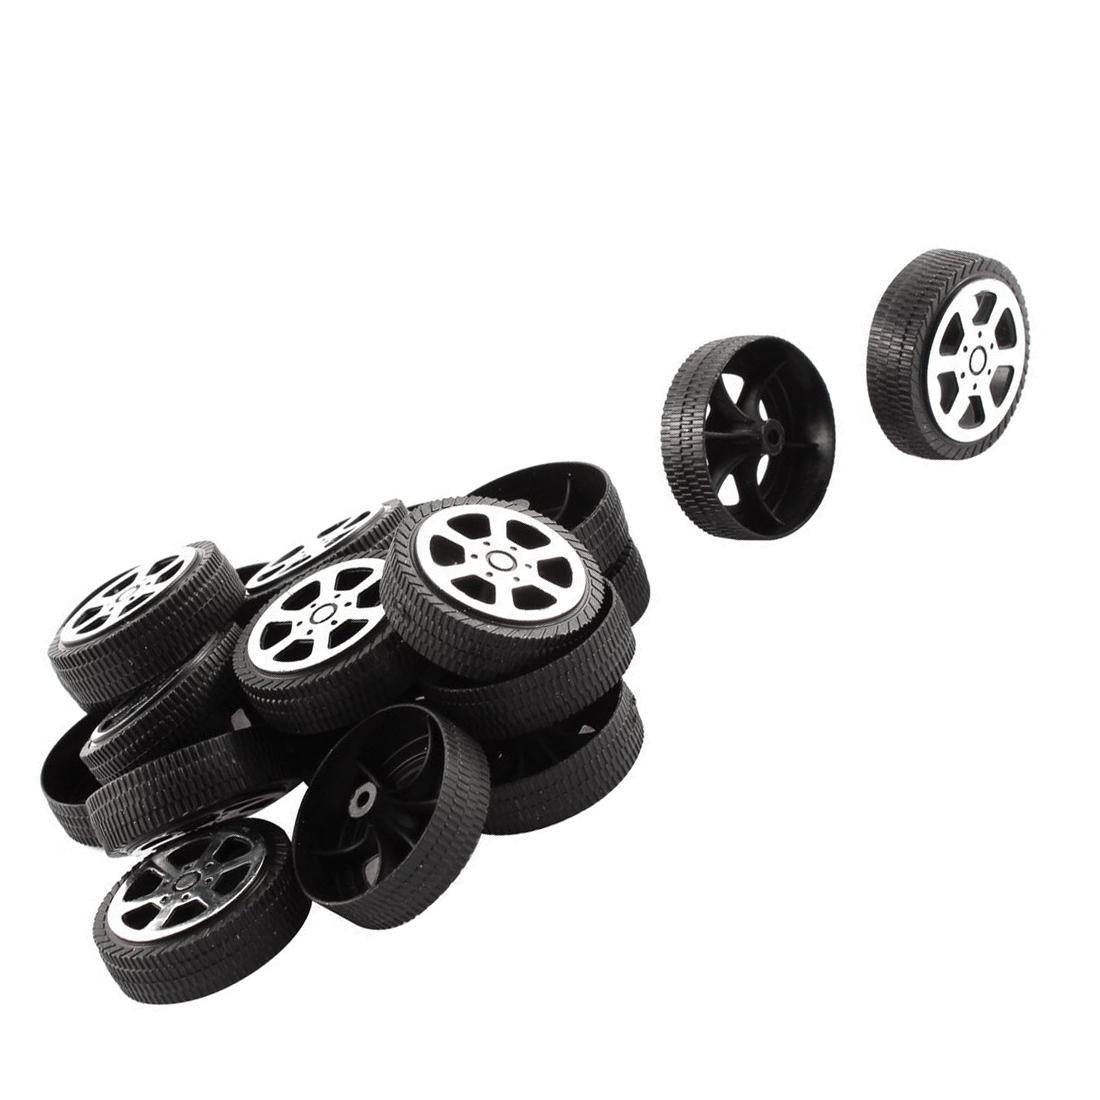 20 stk plastik rolle 2mm durchmesser welle auto lkw modell spielzeug raede n9a3 ebay. Black Bedroom Furniture Sets. Home Design Ideas